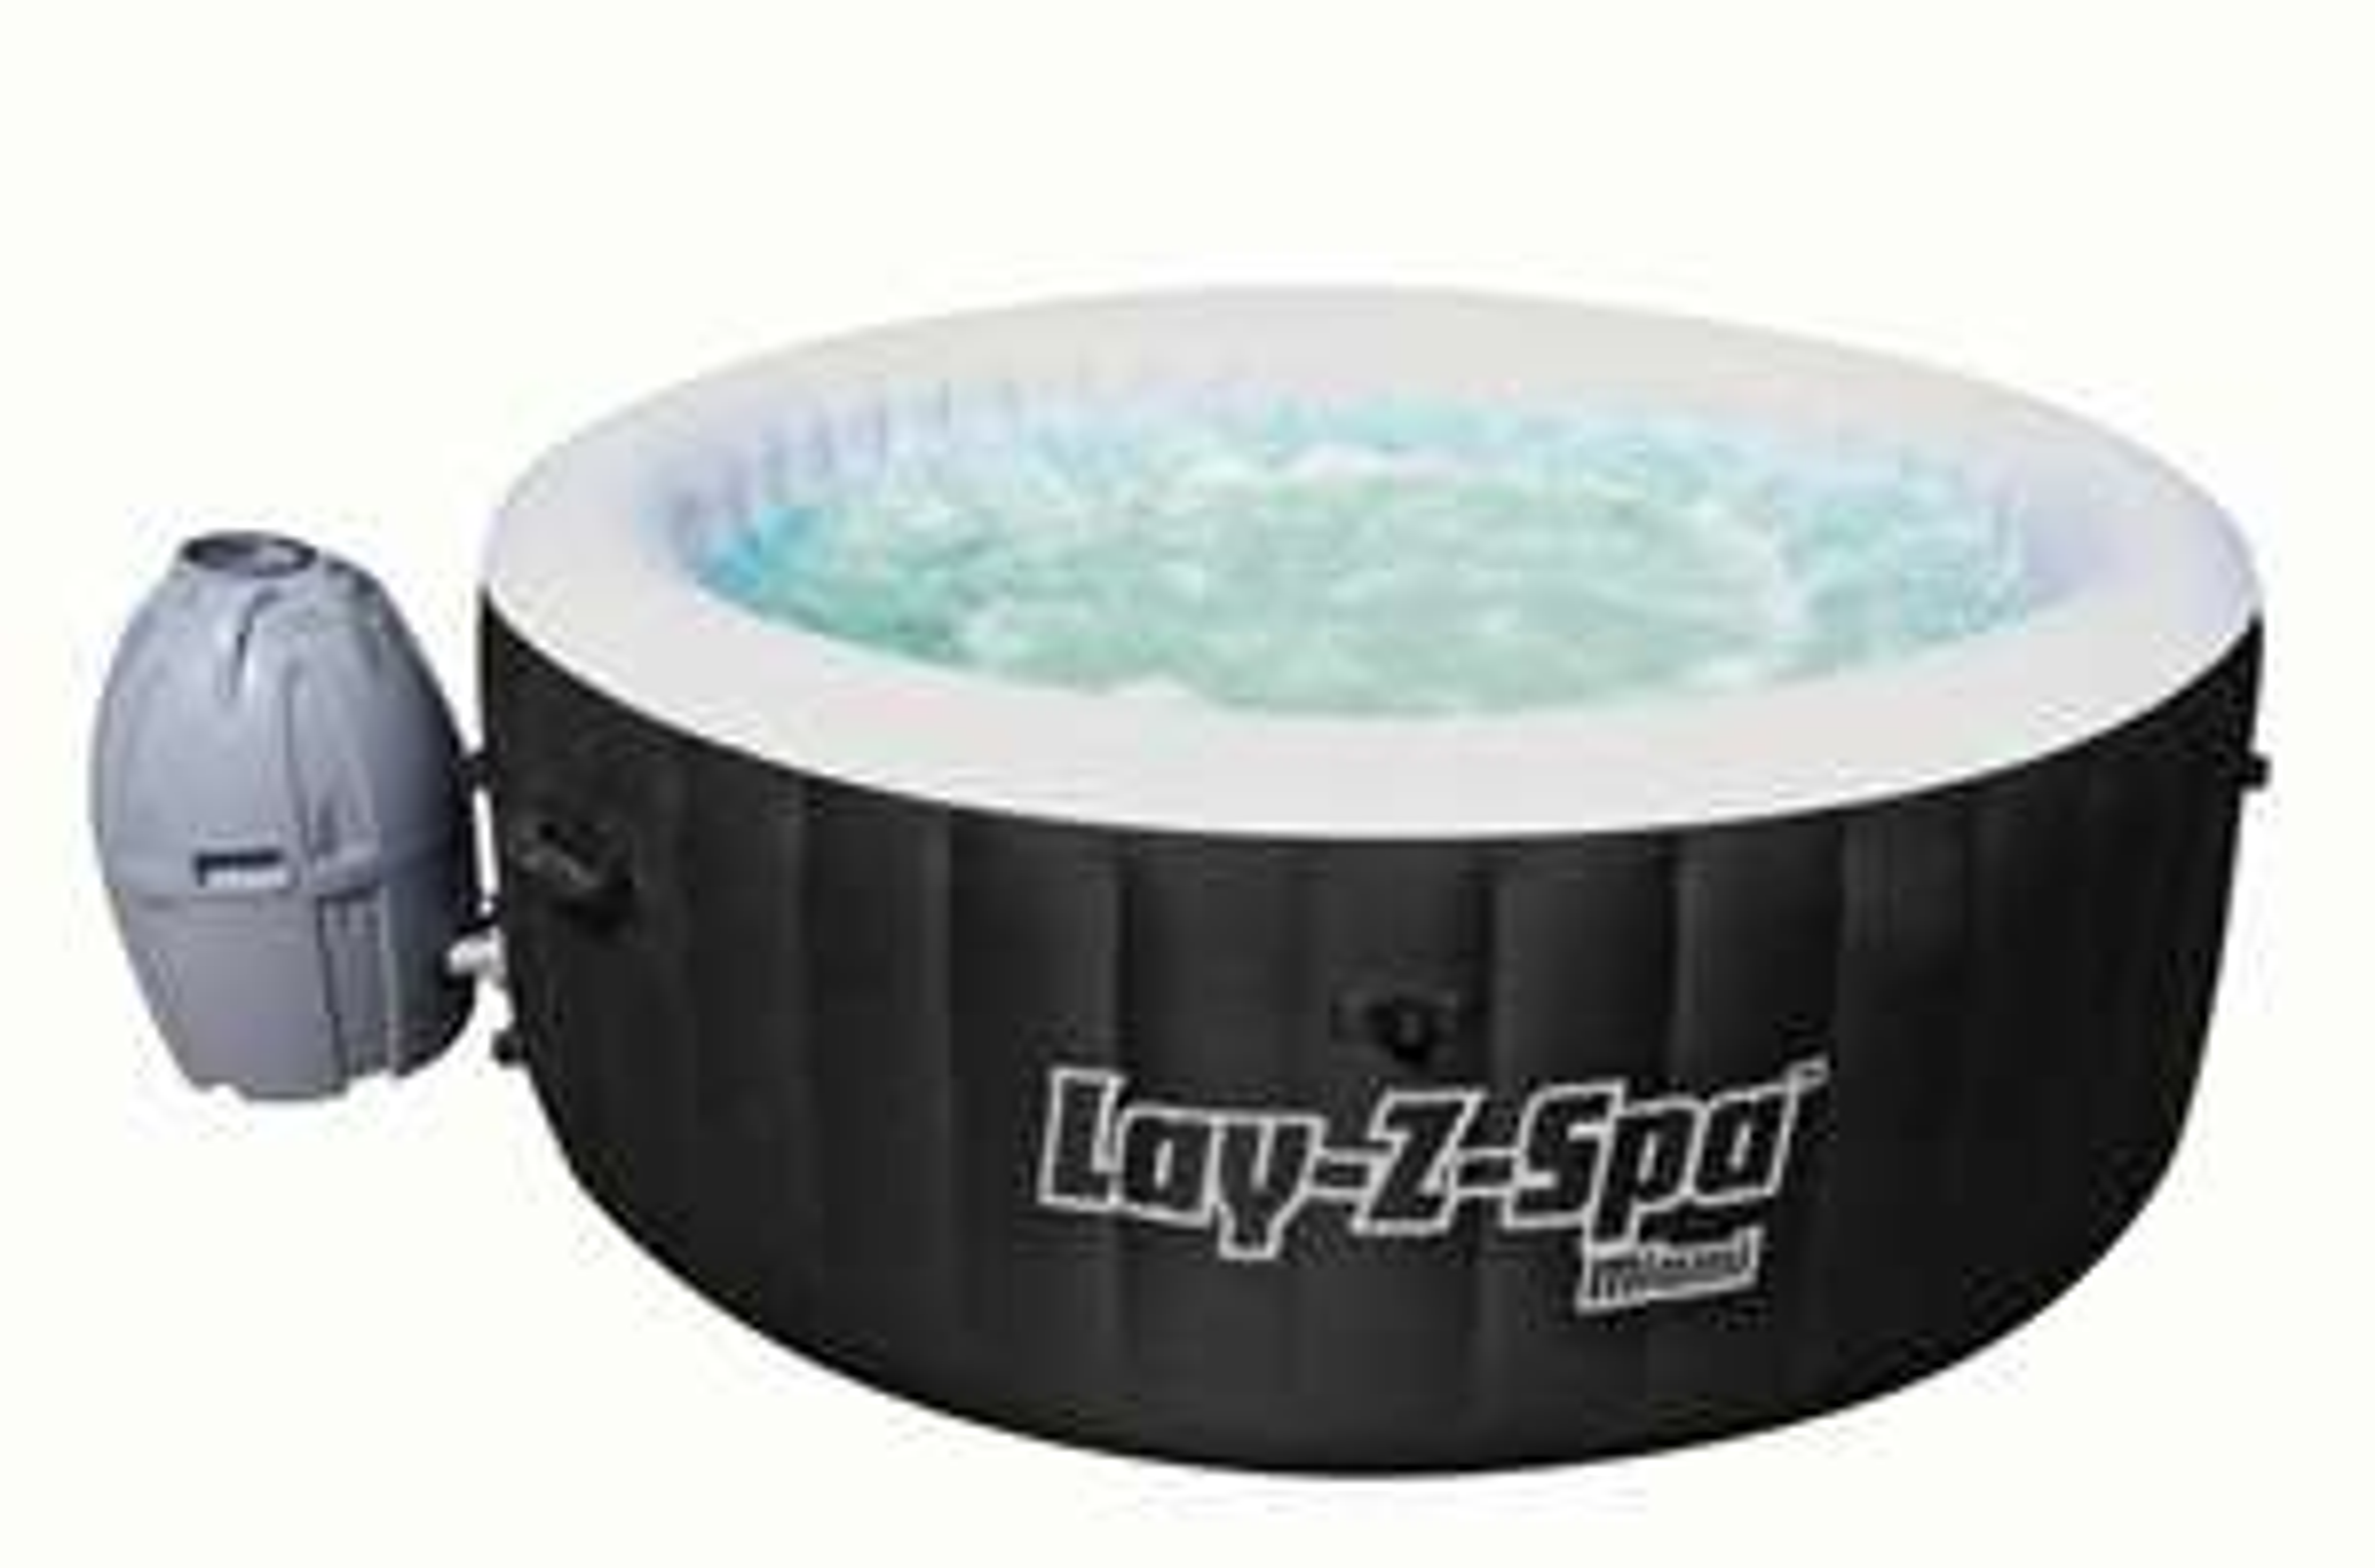 Whirlpool Aufblasbar Lay-Z-Spa Miami Ø:180 X H:66cm 54123